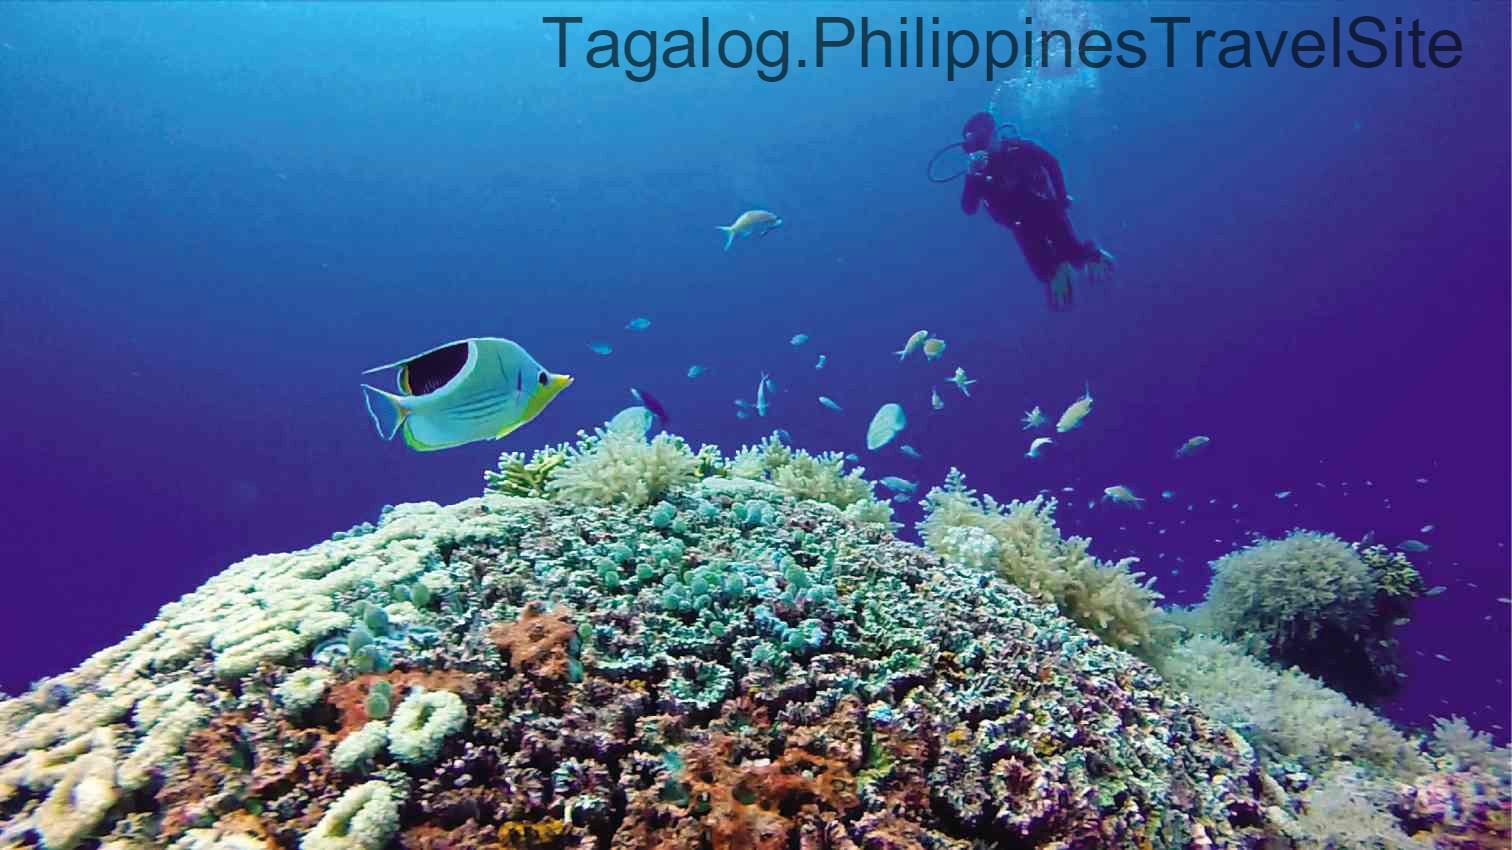 Tourist Atraksyon sa Pilipinas